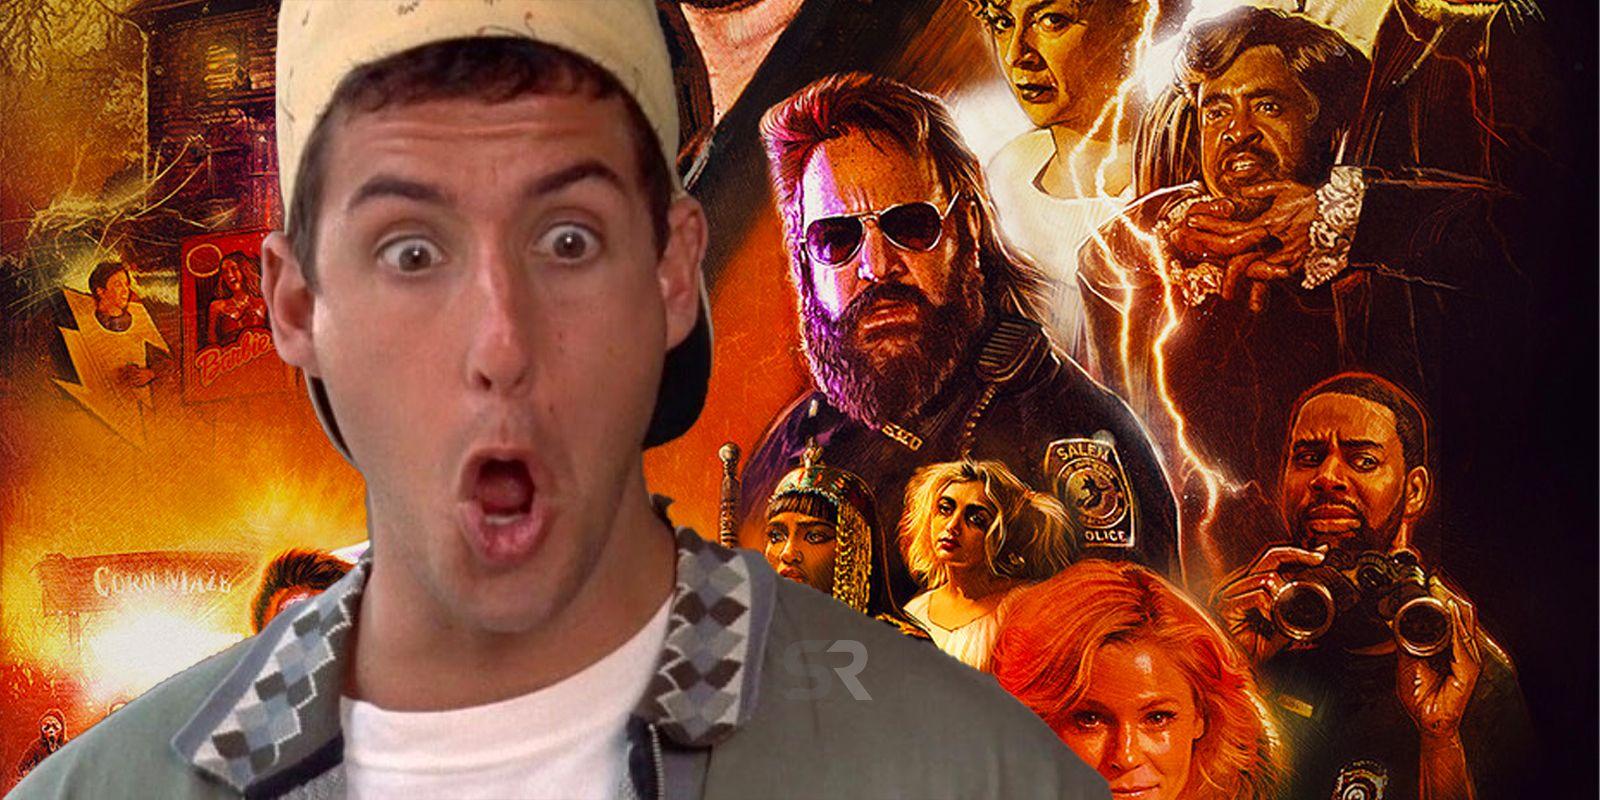 Adam Sandler Wants To Make A 'Sandlerverse' For His Original Characters